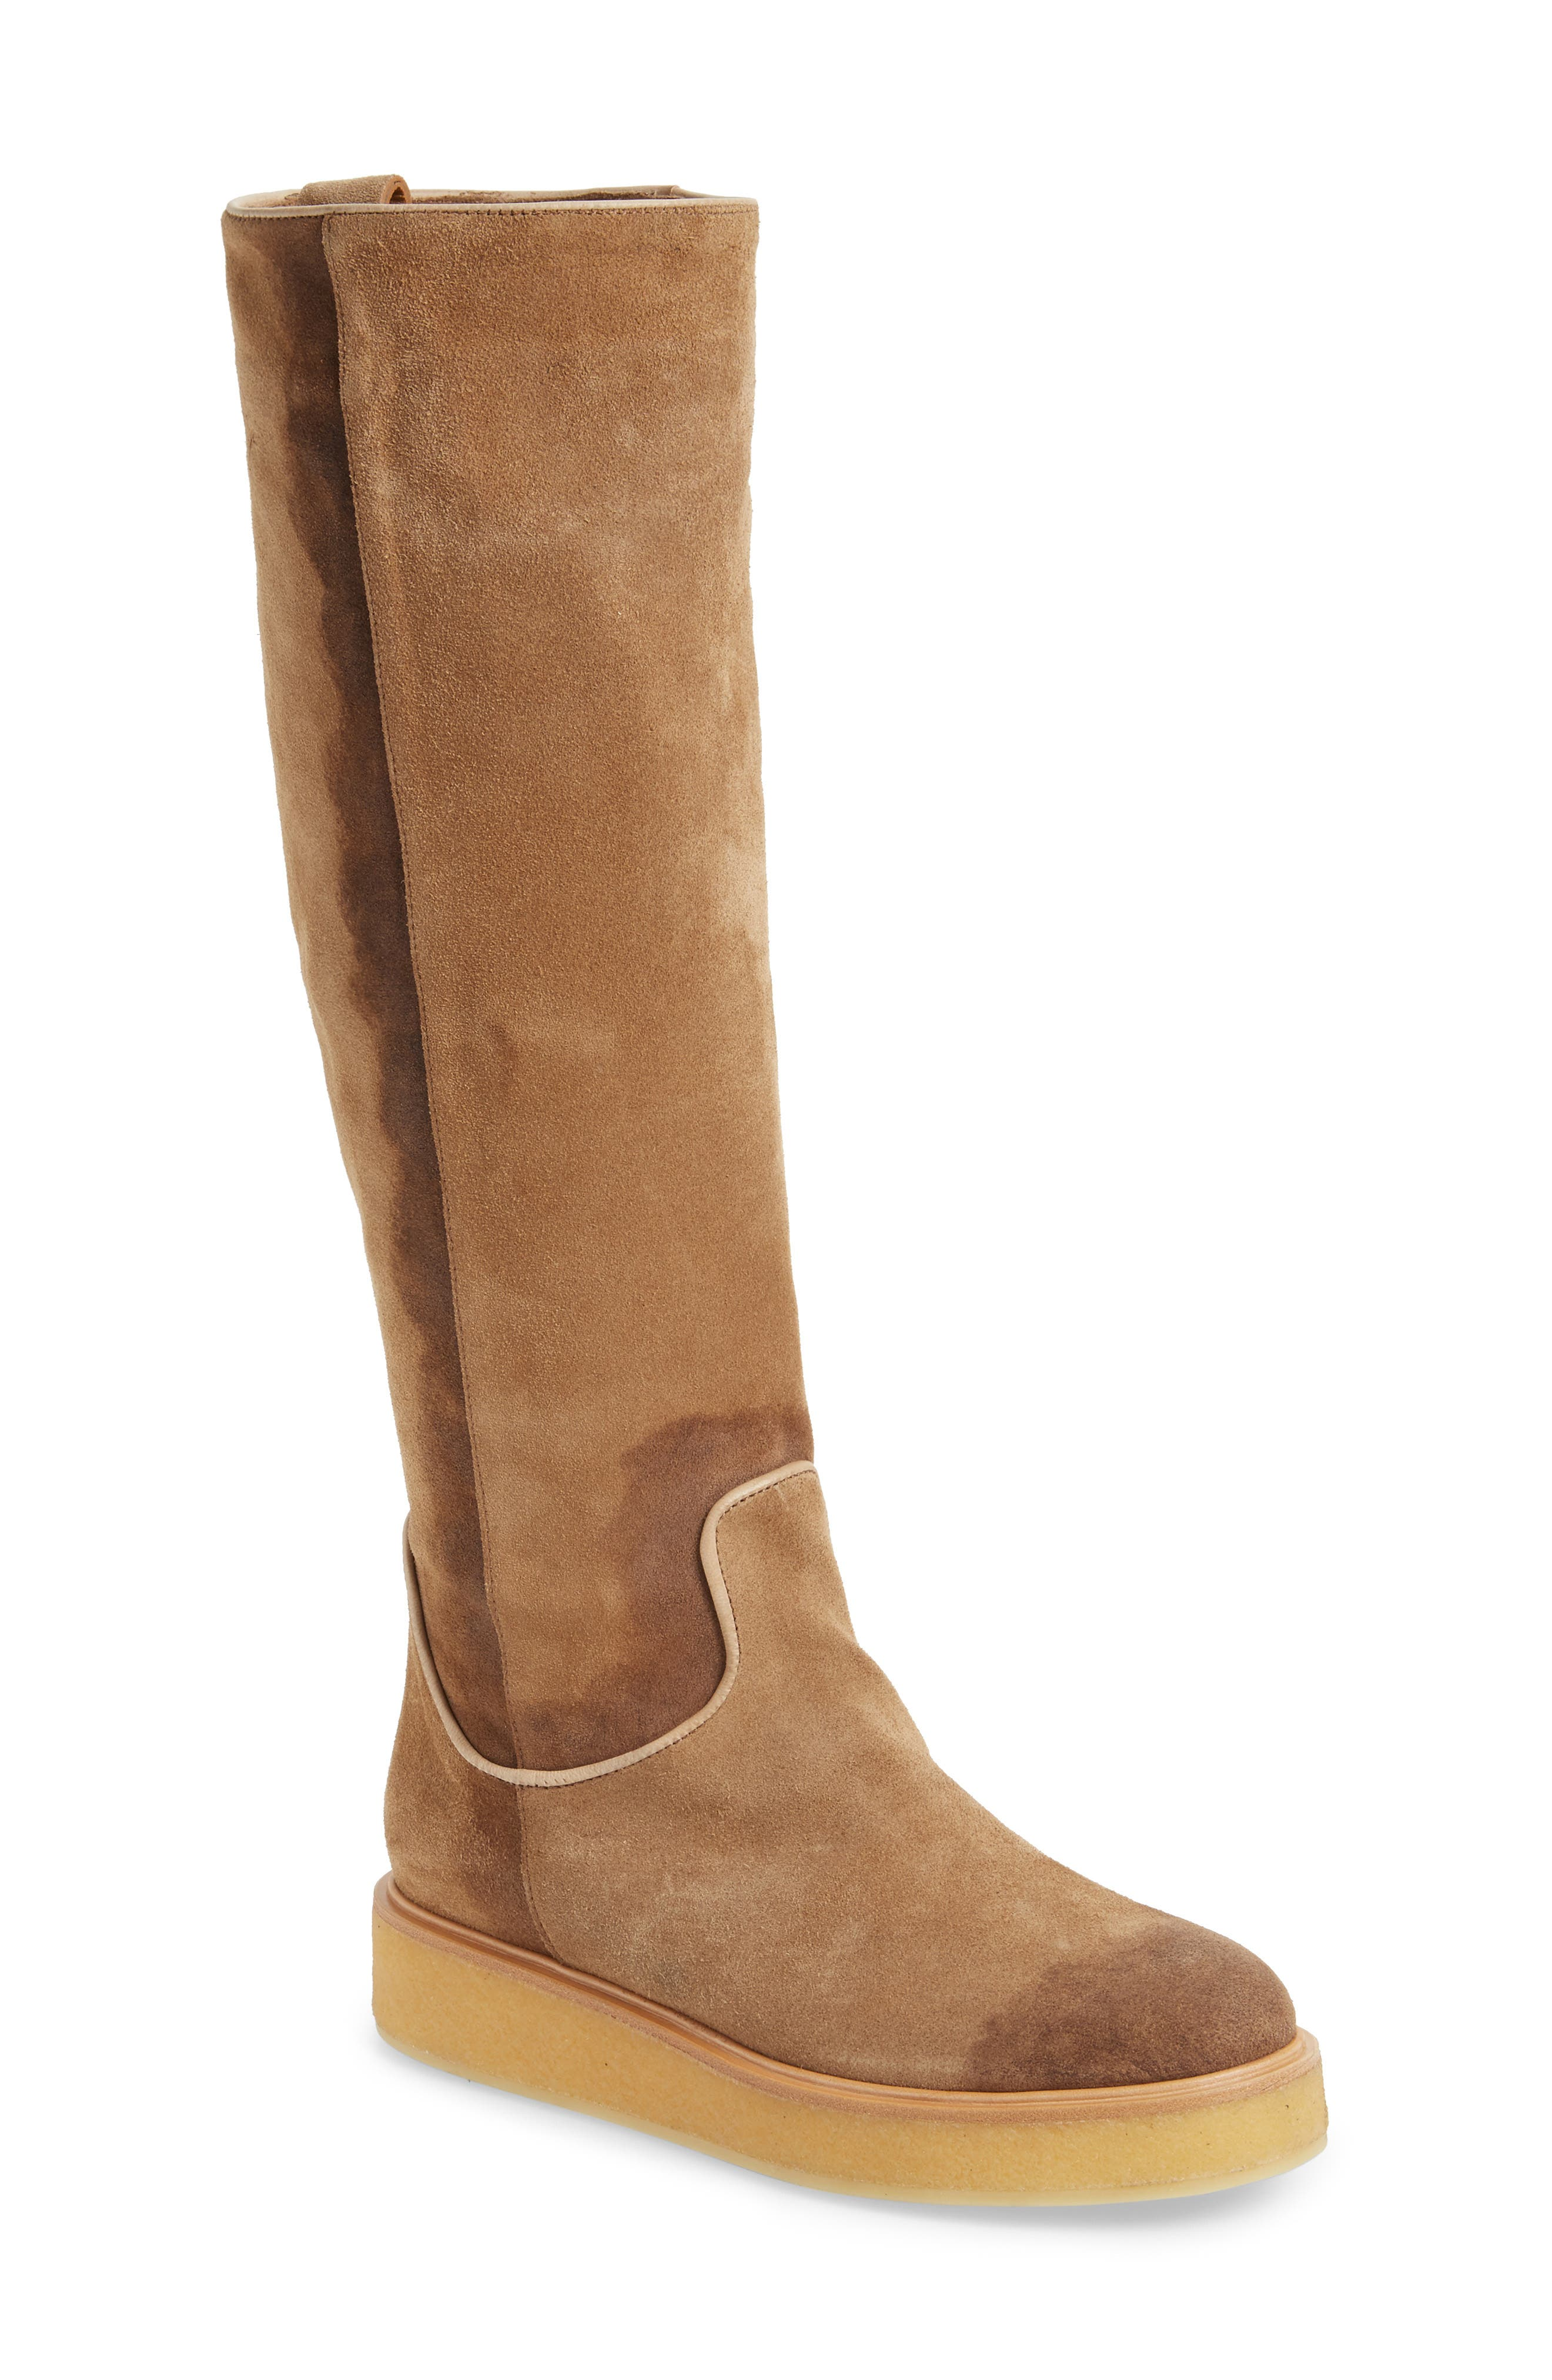 Nerola Knee High Boot,                             Main thumbnail 1, color,                             200